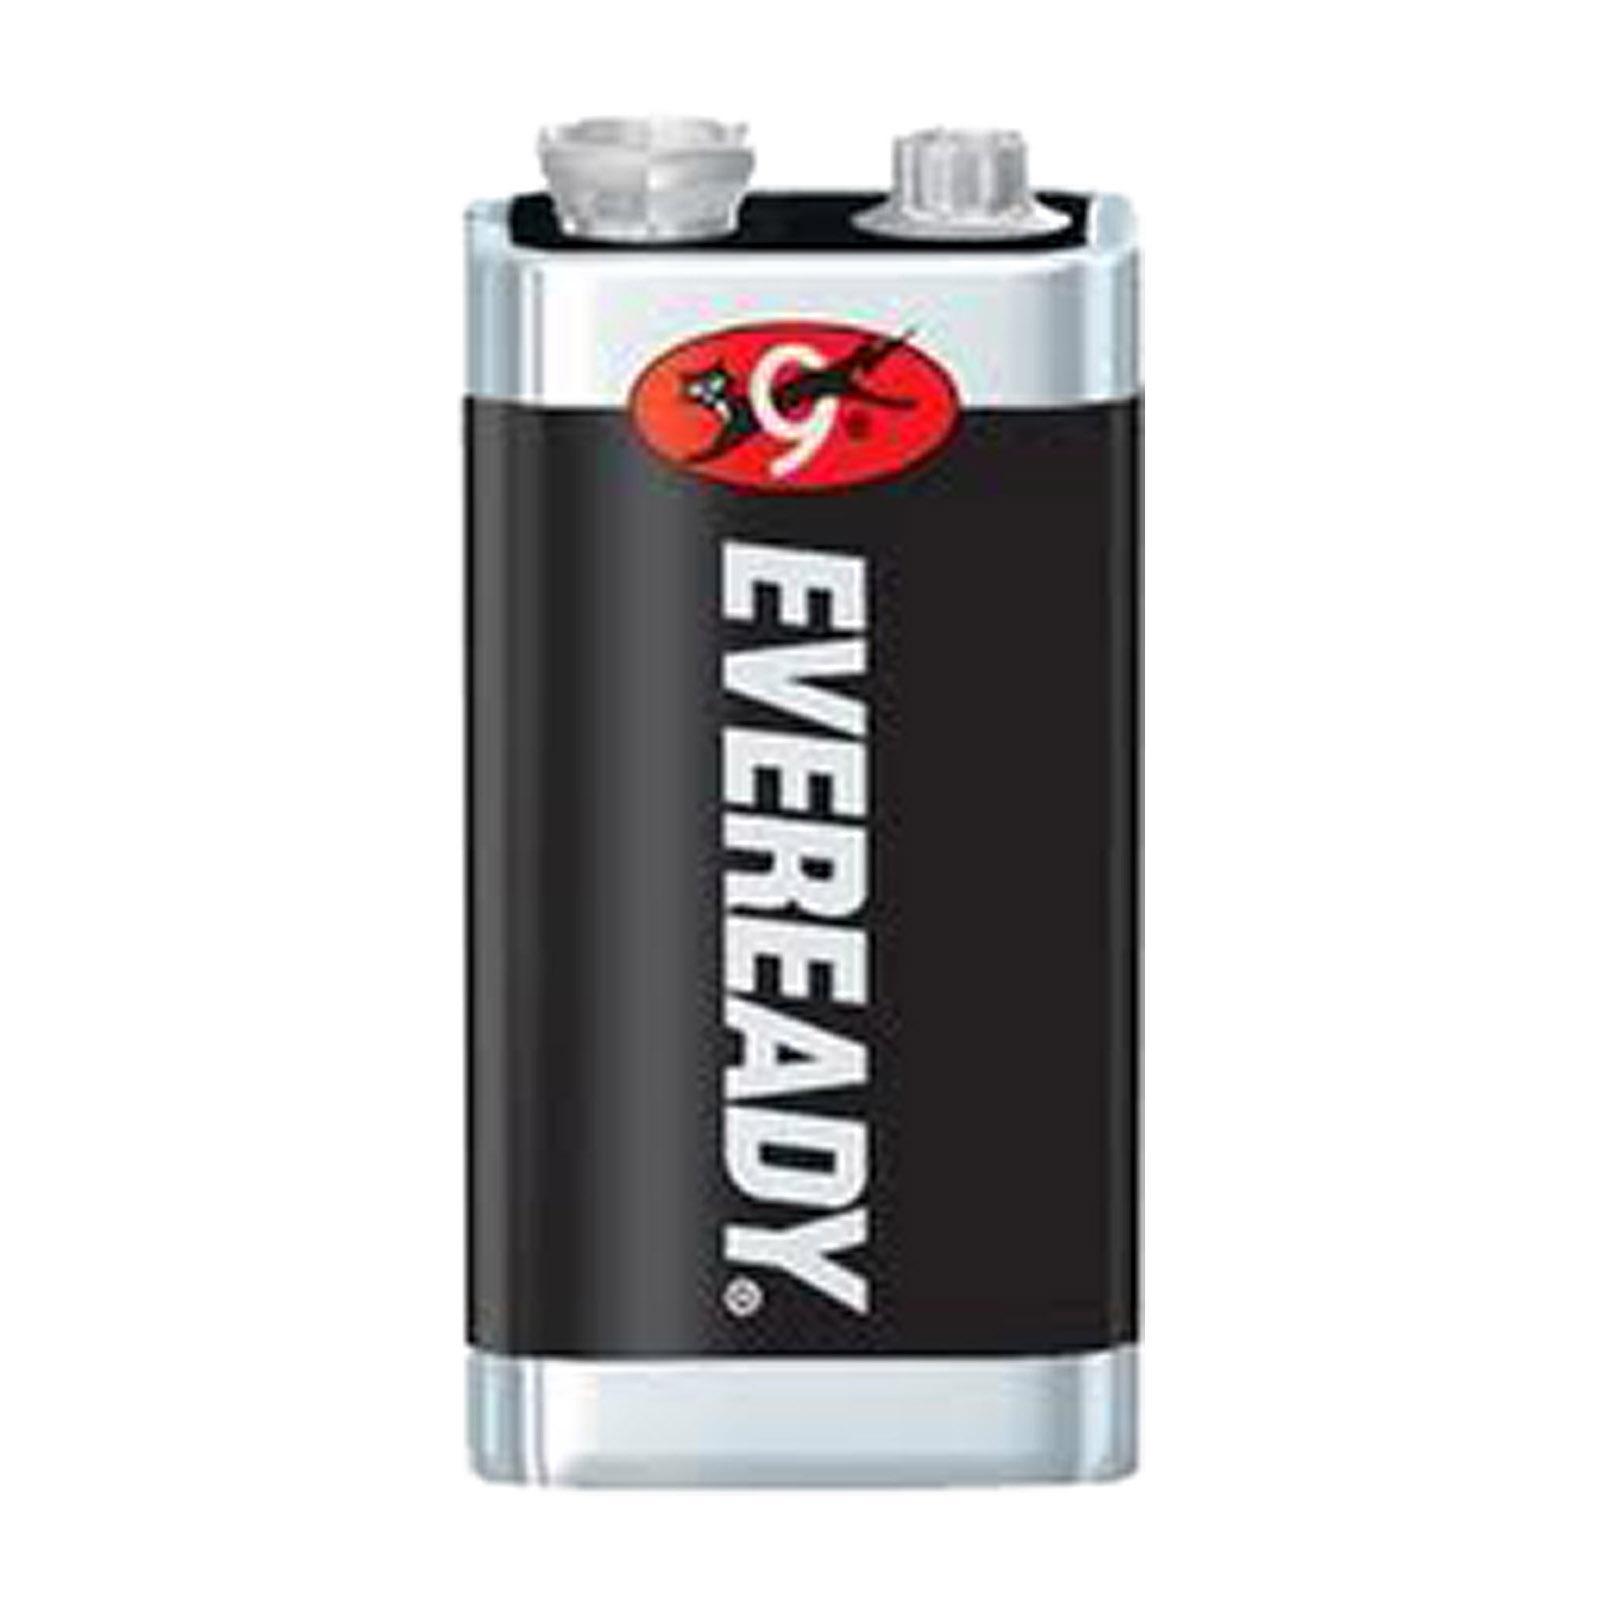 Eveready M1222 Sw1 Carbon Zinc Battery Super Heavy Duty Size:9V (1Pc/Pack)